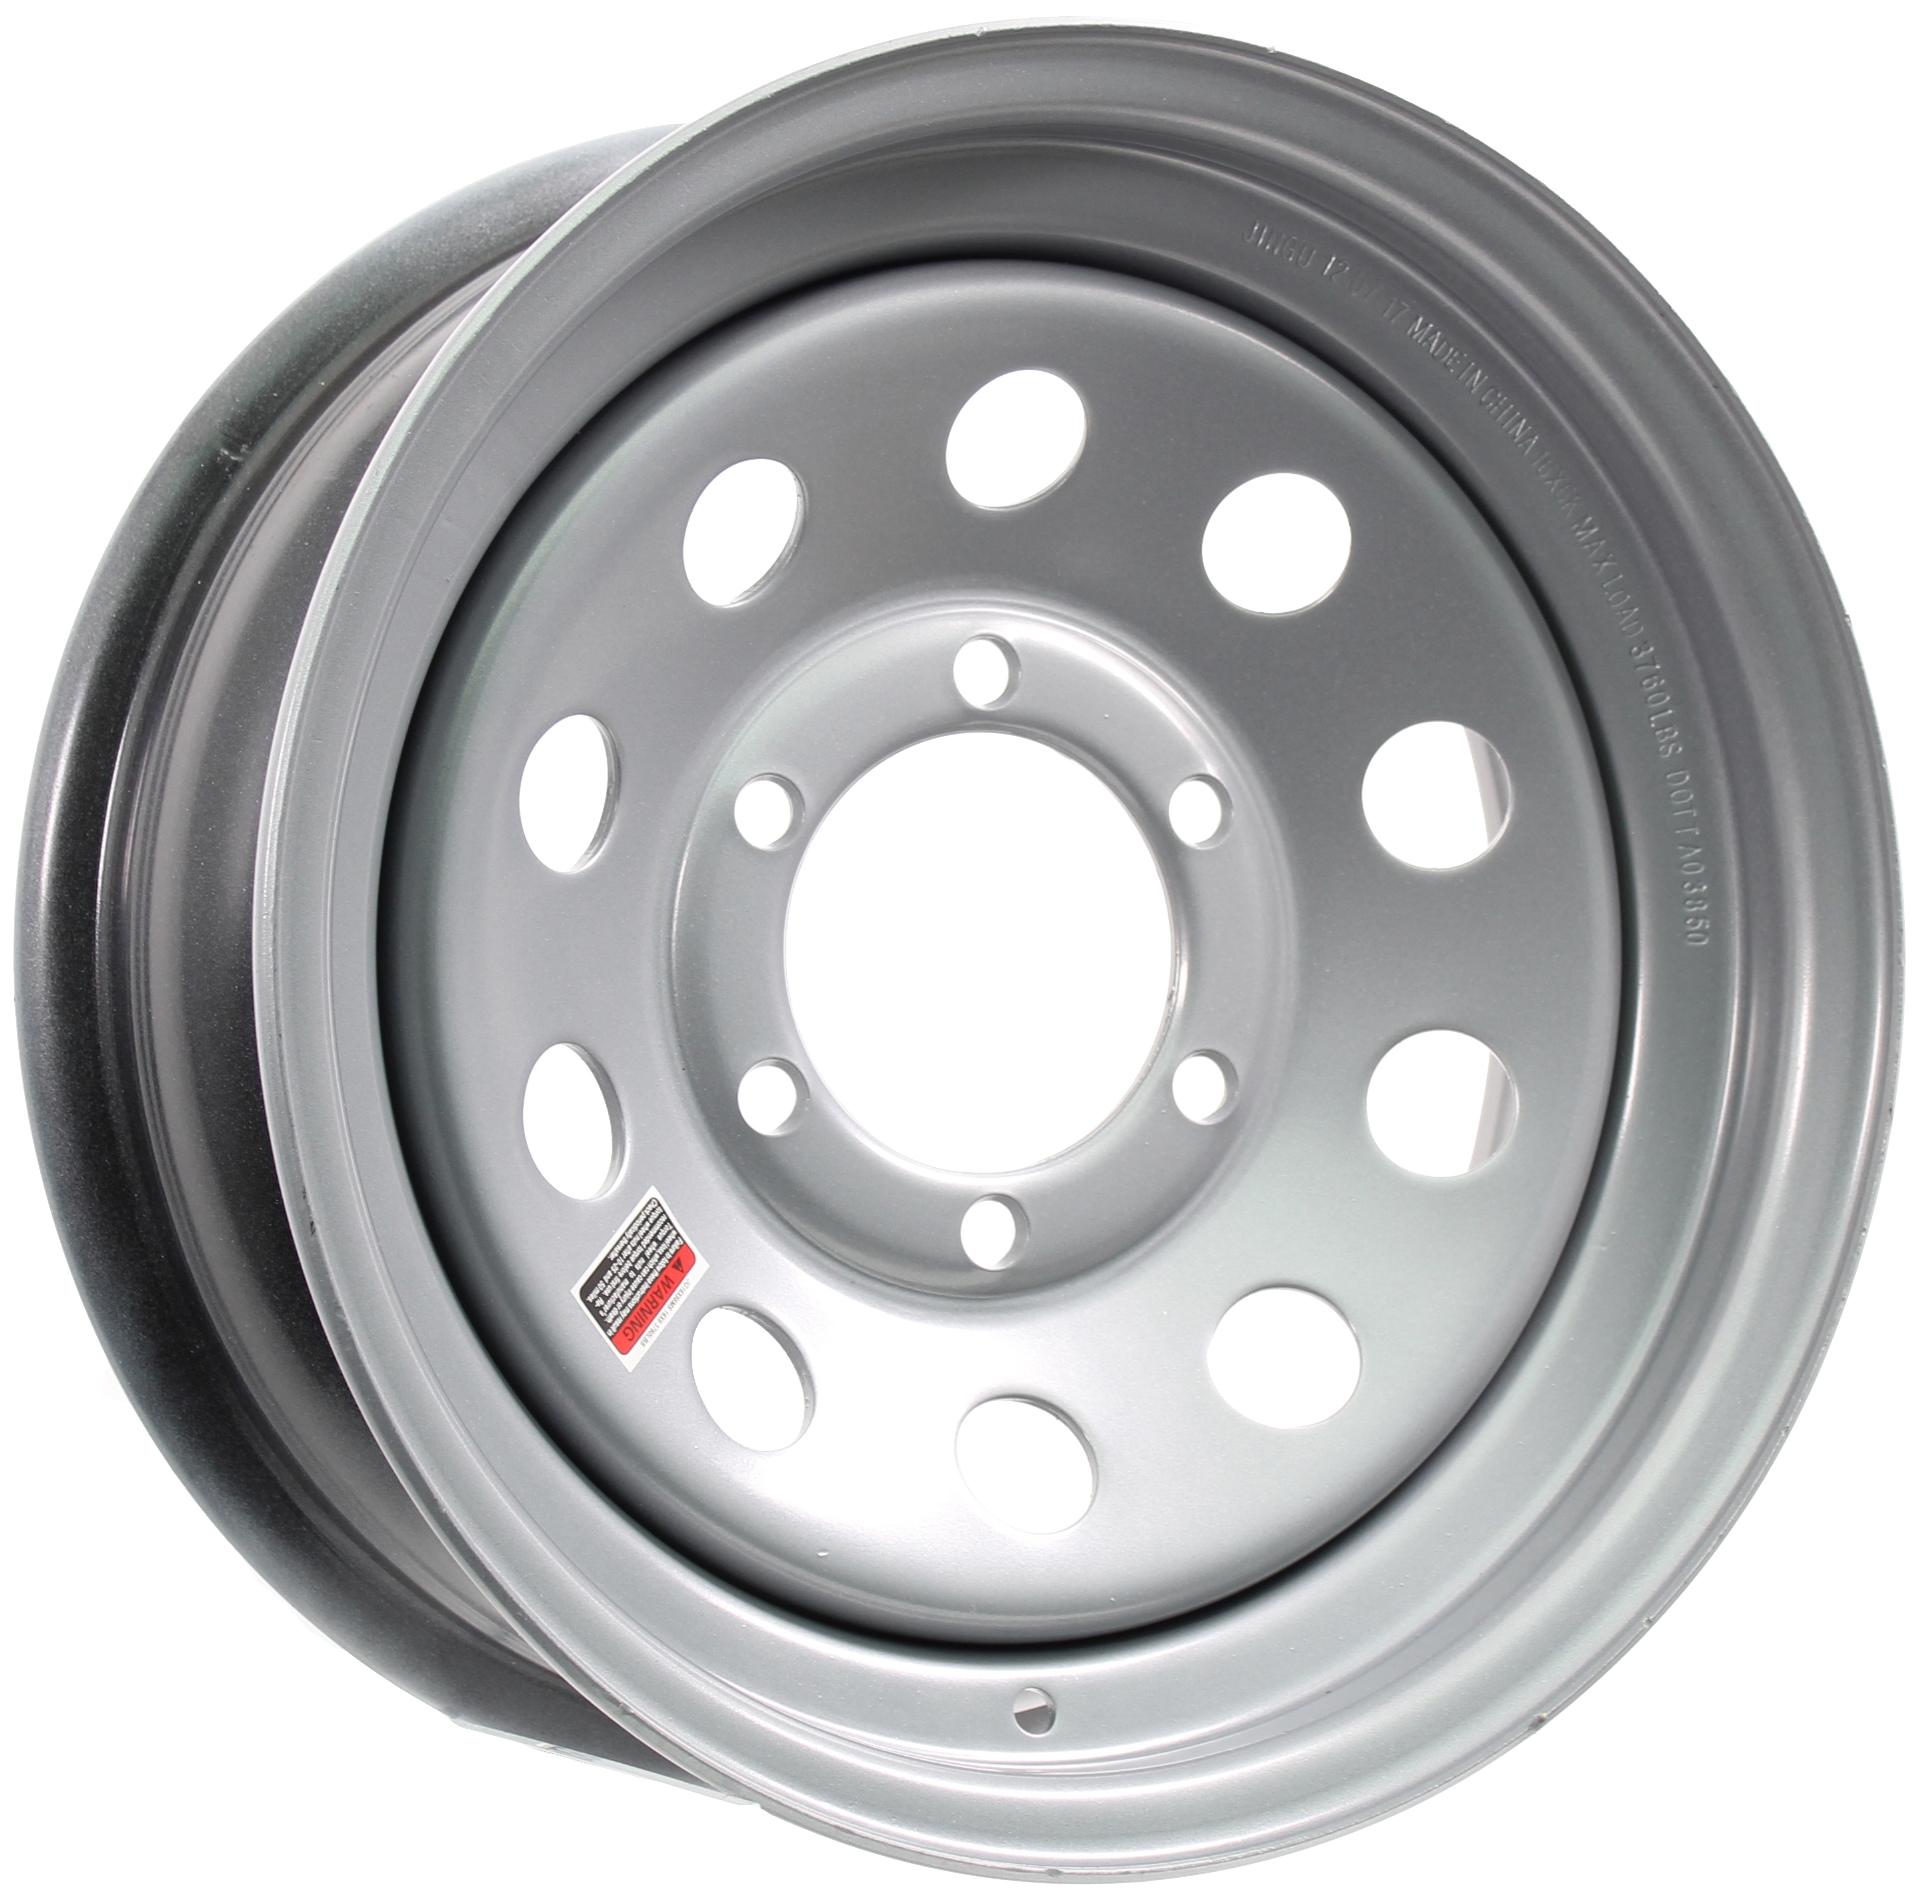 16x6 6-Lug Silver Mod Steel Trailer Wheel Image